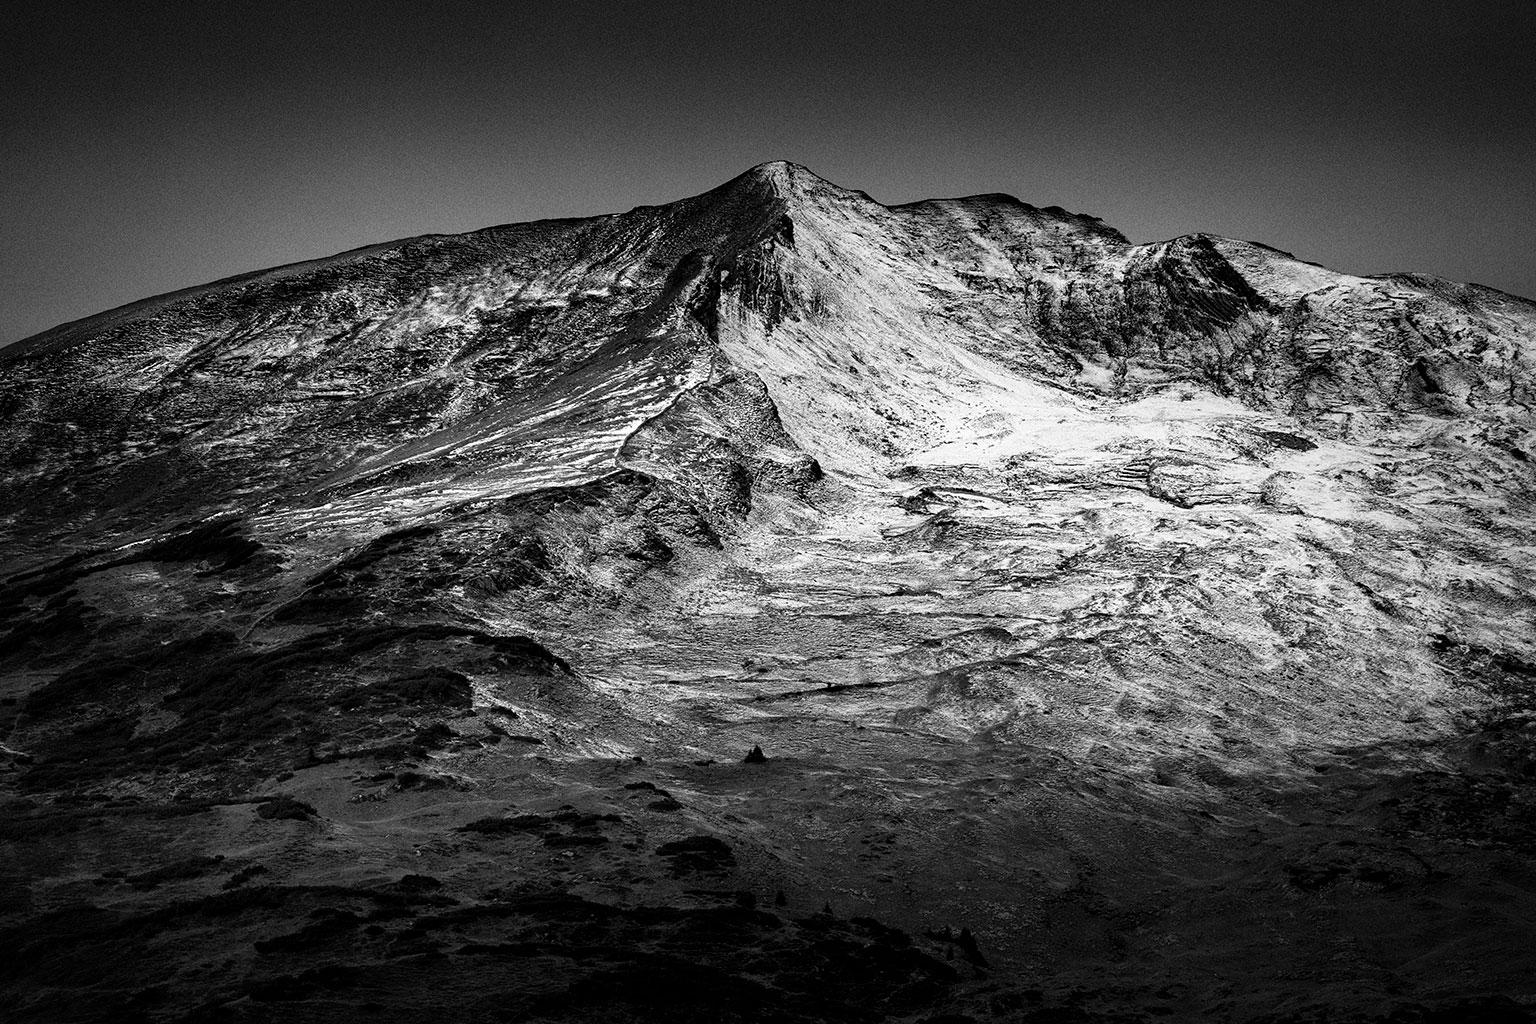 Alpen_Berge_Landschaftsfotografie_Oldenburg_Harry_Koester